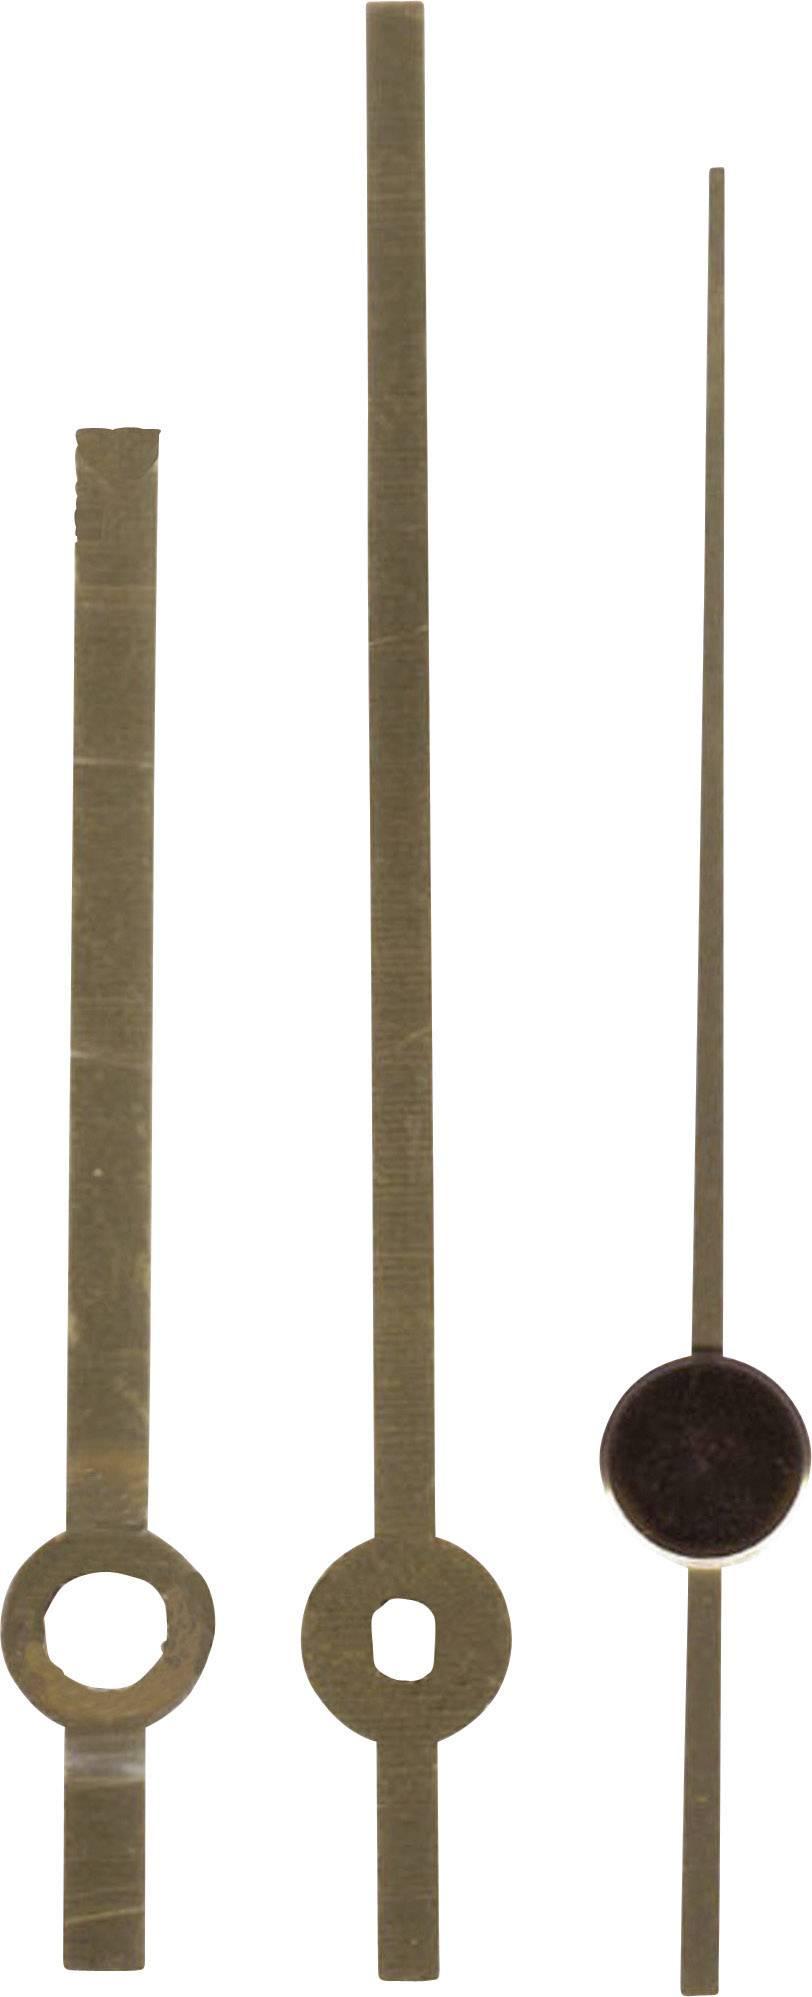 Sada hodinových ručiček Leštěné/Standard (h x m x s) 60 mm x 80 mm x 70 mm, mosaz, mosaz